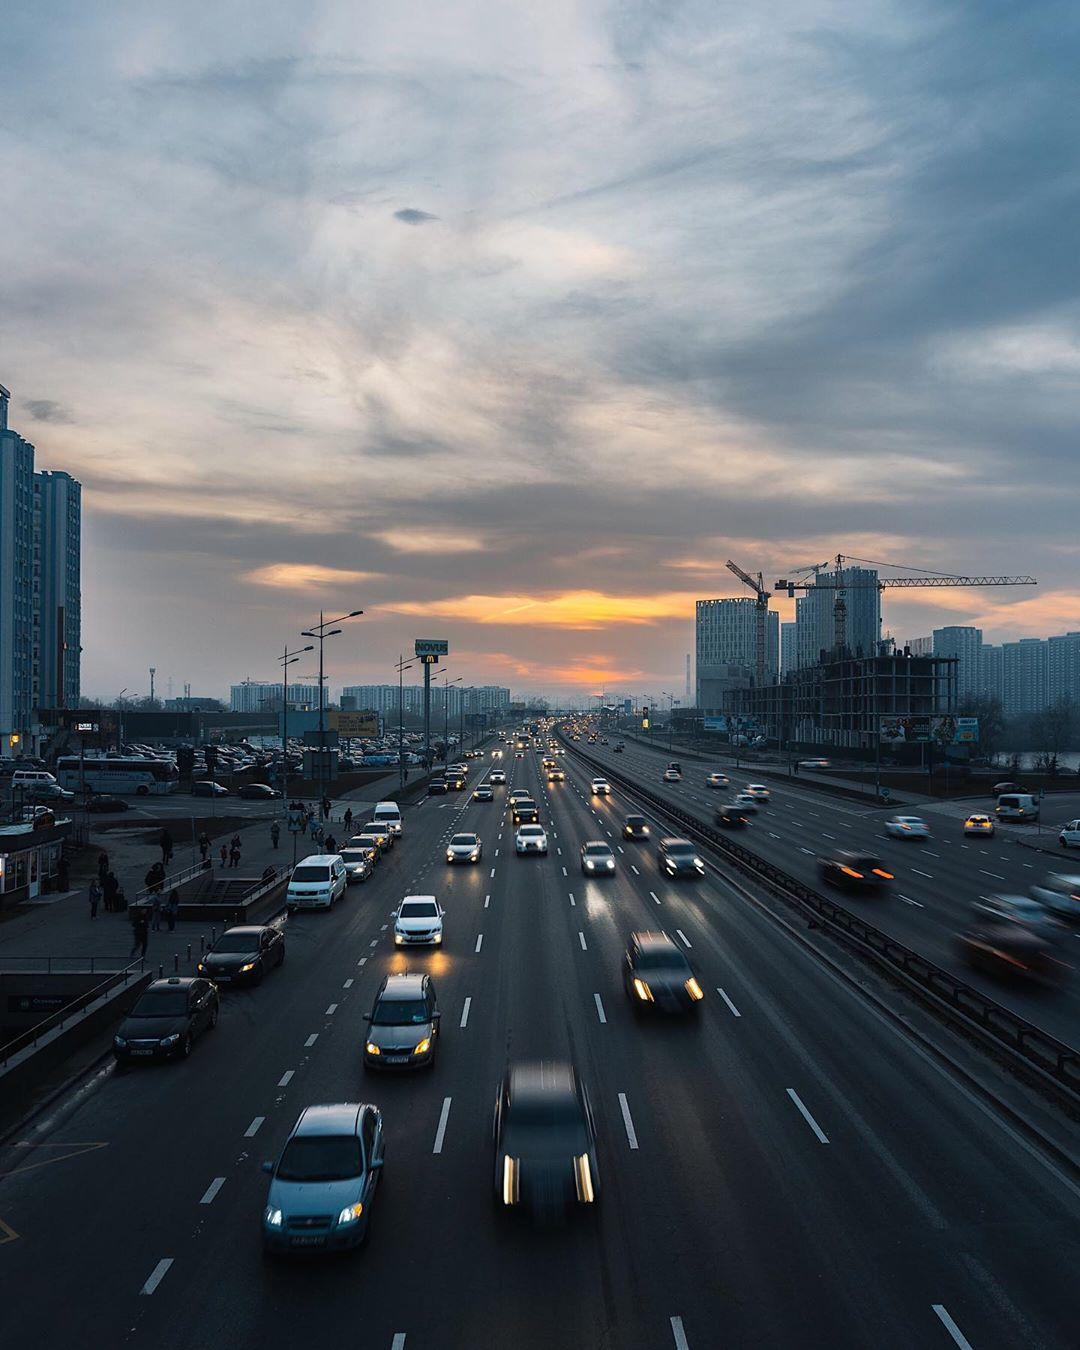 Закат в Киеве. Холст, масло. Художник - @zhukevych